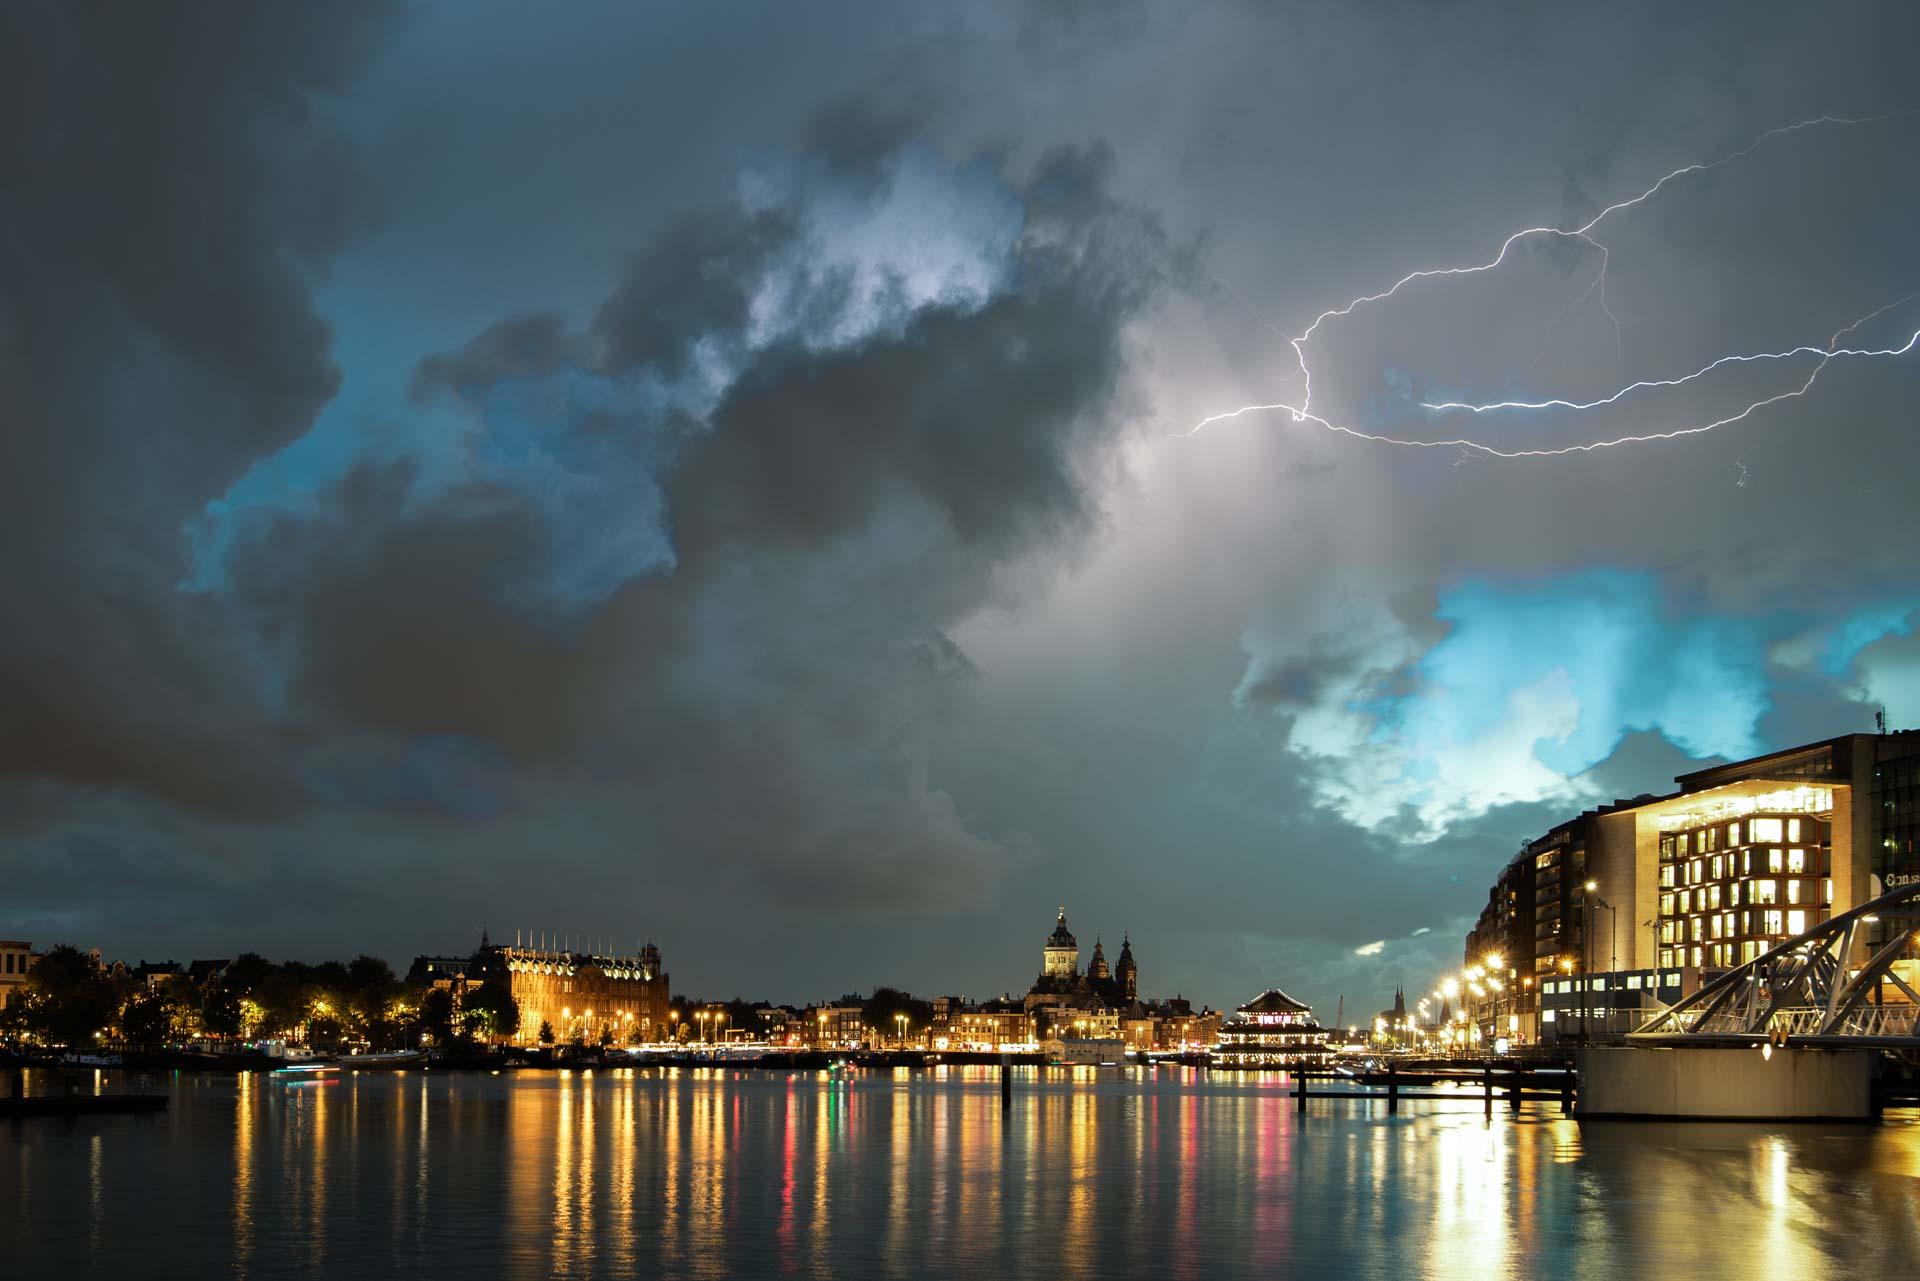 Nachtfotografie Amsterdam bliksem onweer centrum